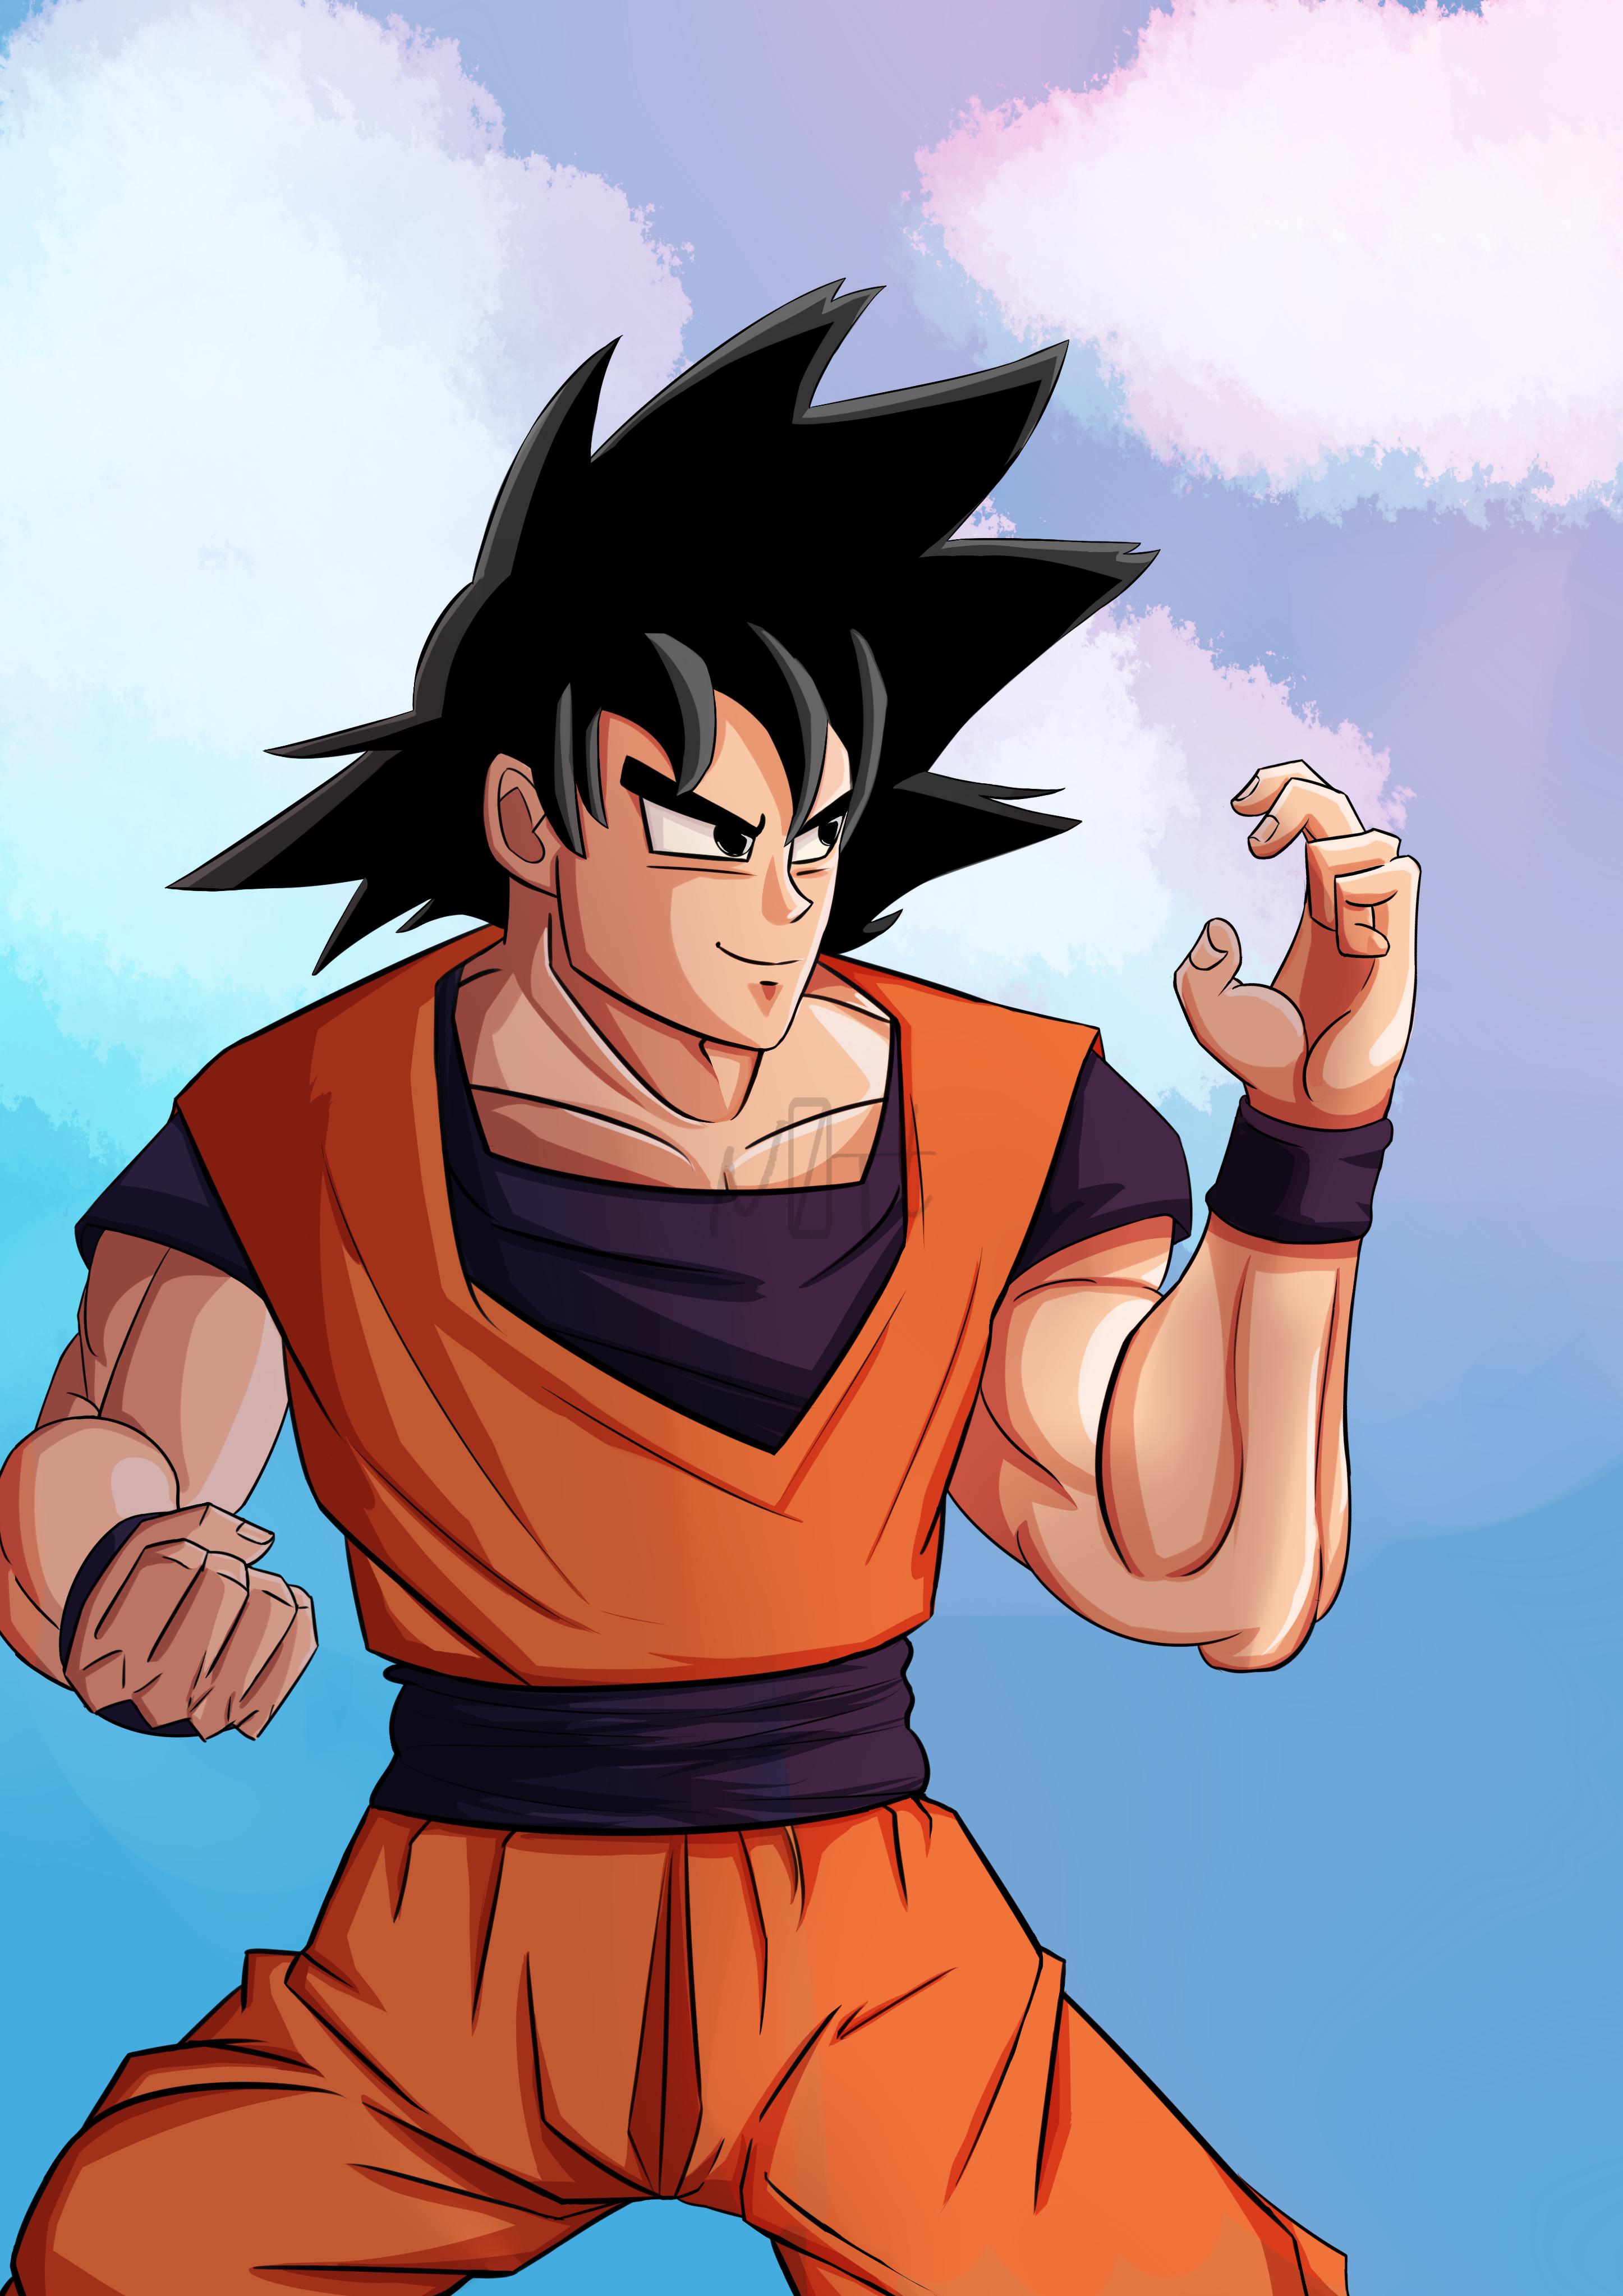 Pin by CaoXD on my work Anime, Goku, Superhero